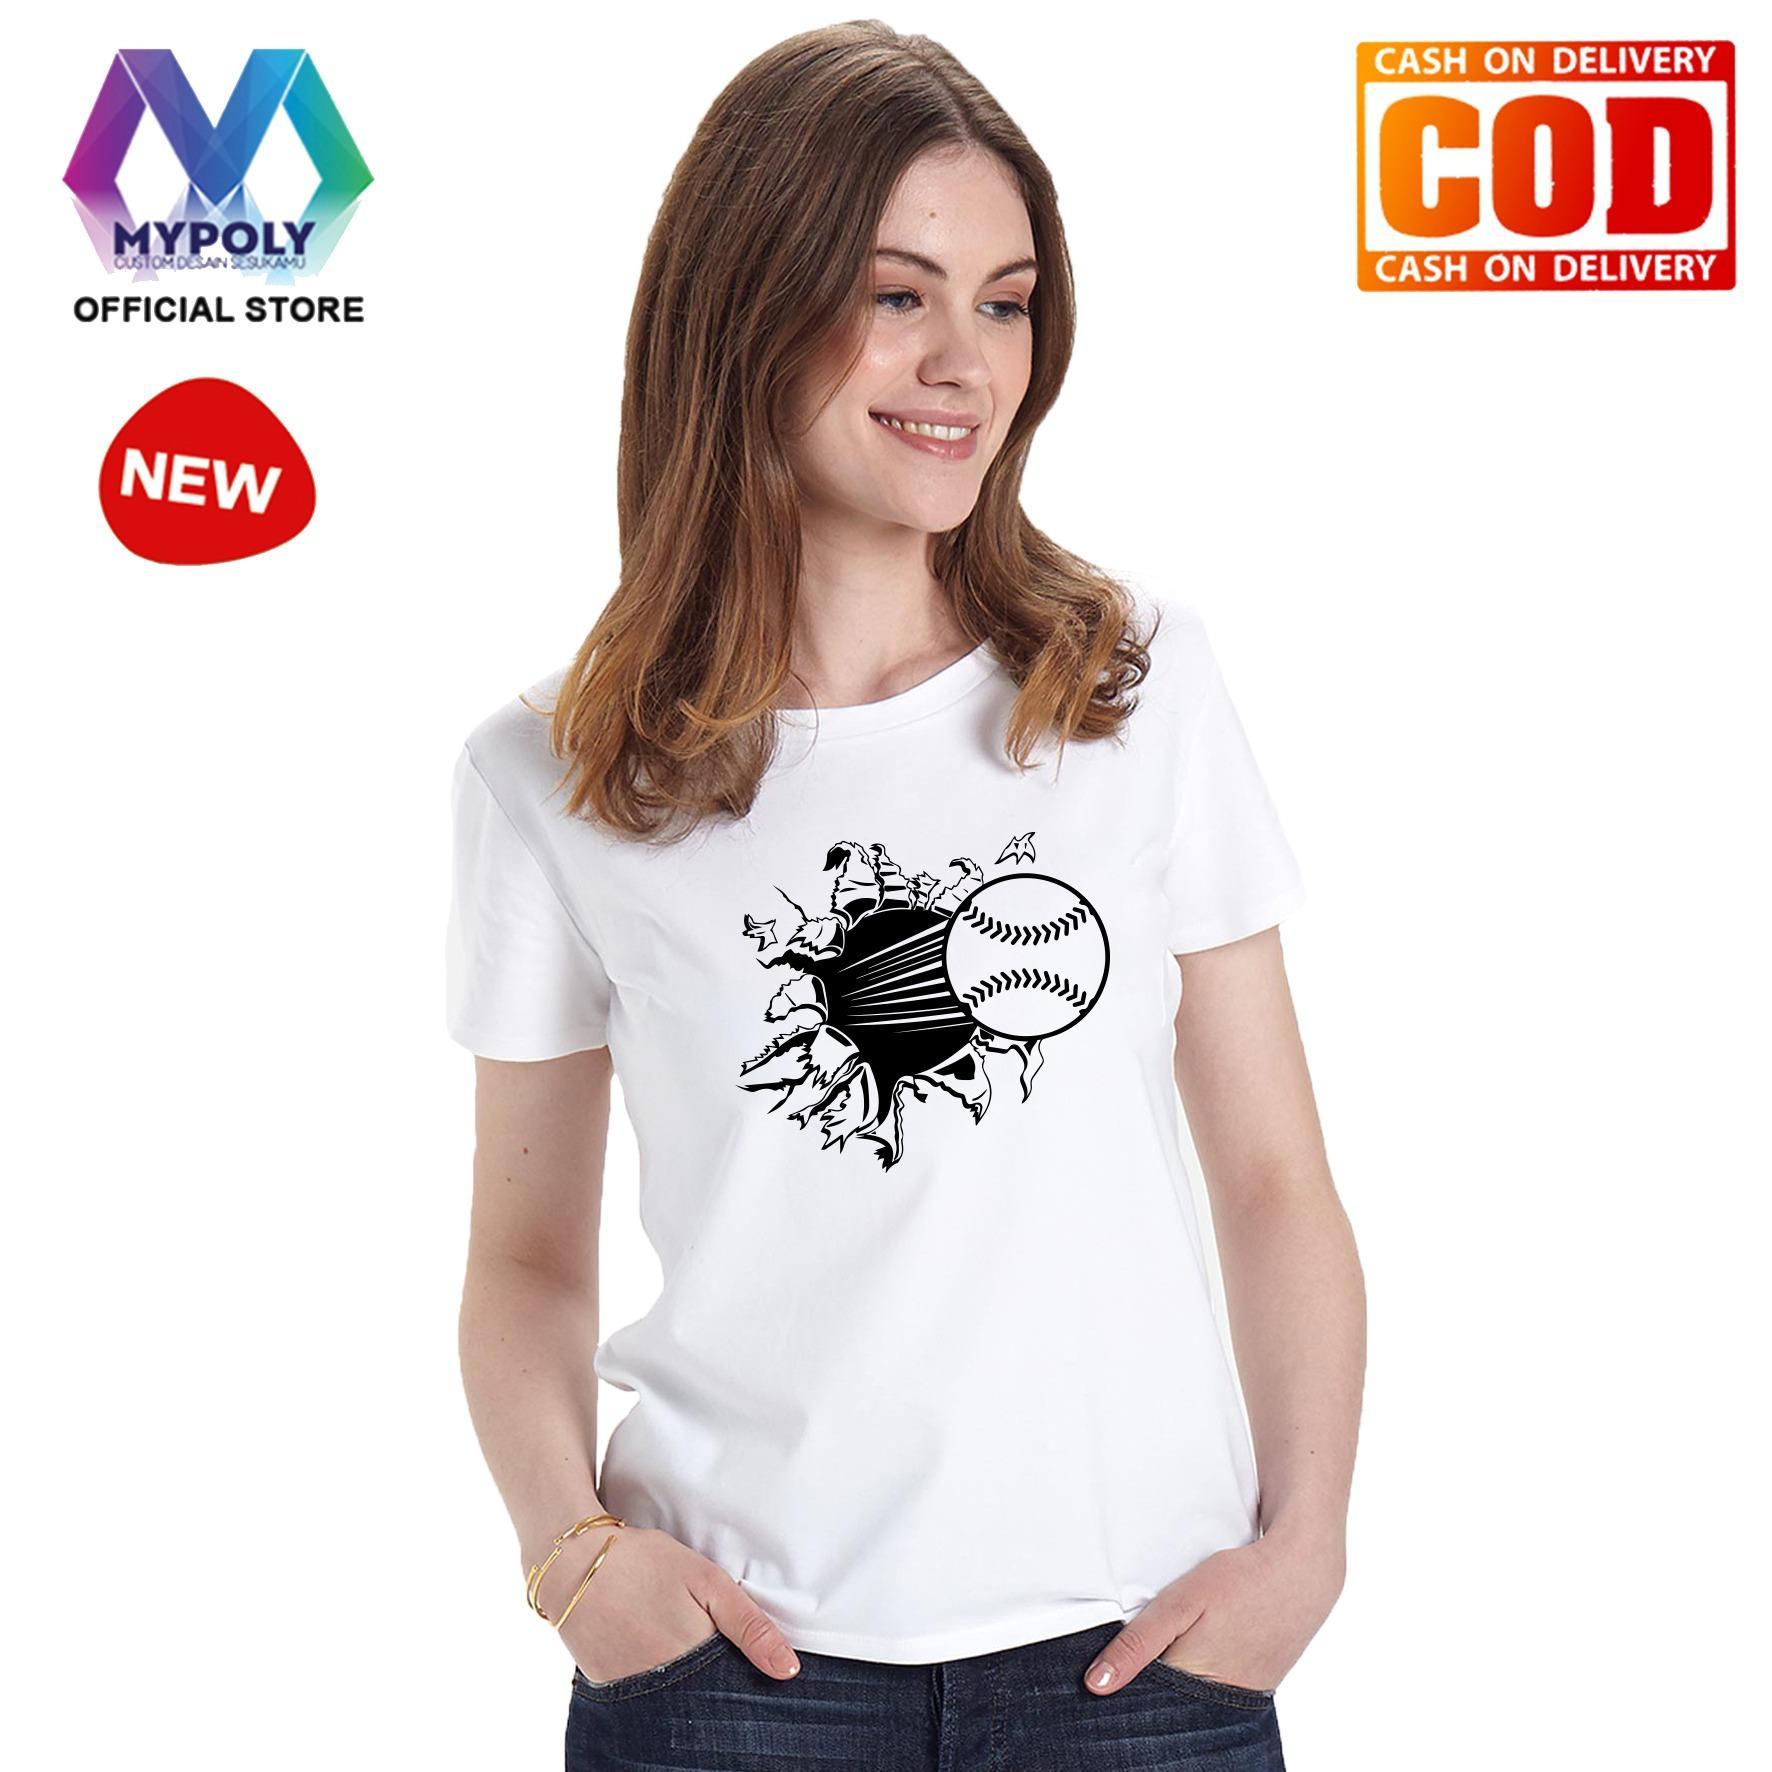 Kaos Premium Mypoly Wanita Perempuan WP / Baju Couple Family Keluarga / Tshirt distro Anak Wanita / Fashion atasan / Kaos Wanita Dewasa Baseball